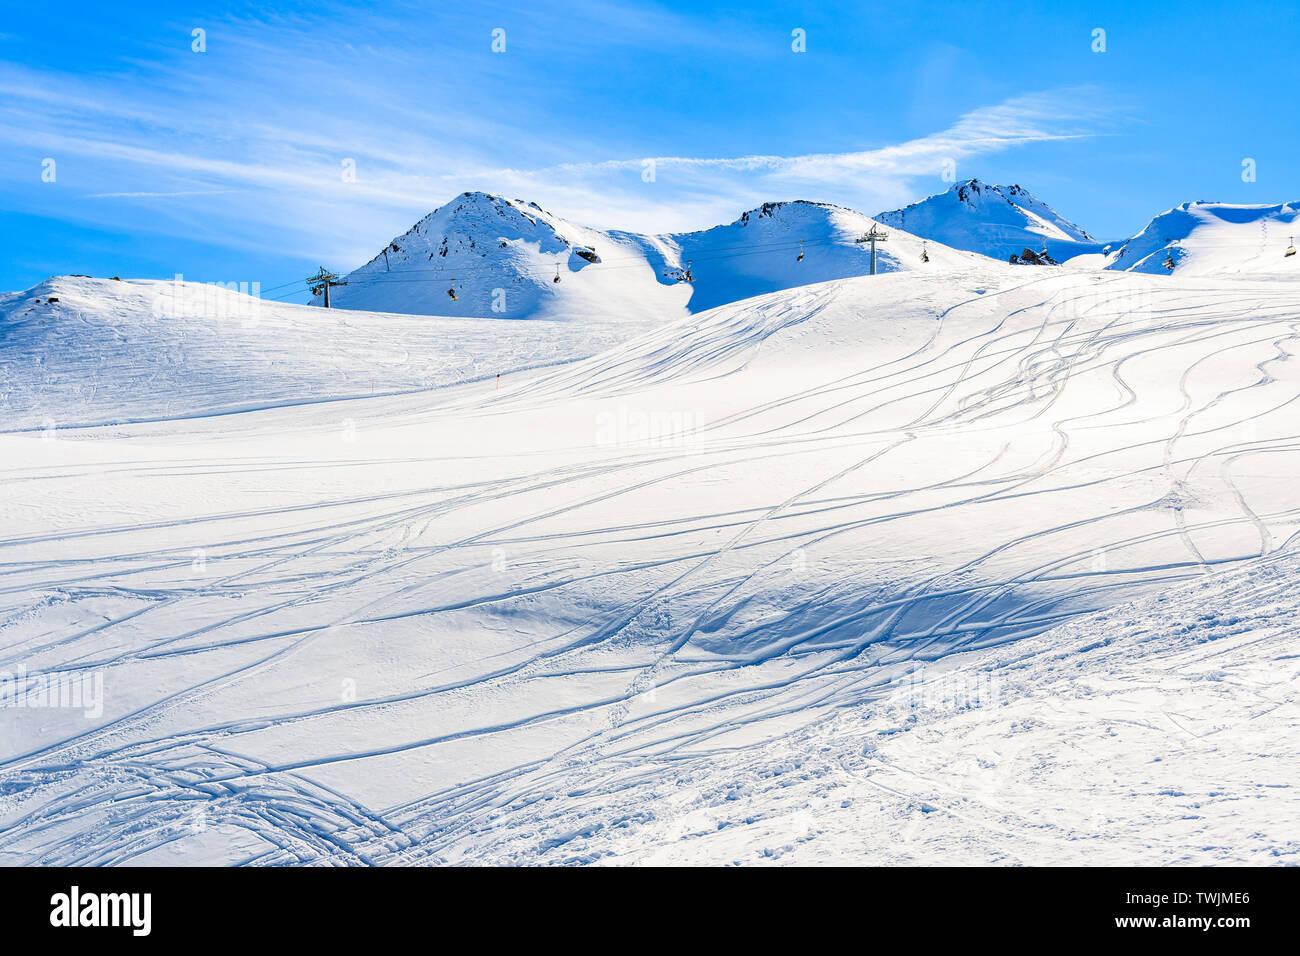 View of ski slope and amazing Austrian Alps mountains in beautiful winter snow, Serfaus Fiss Ladis, Tirol, Austria Stock Photo